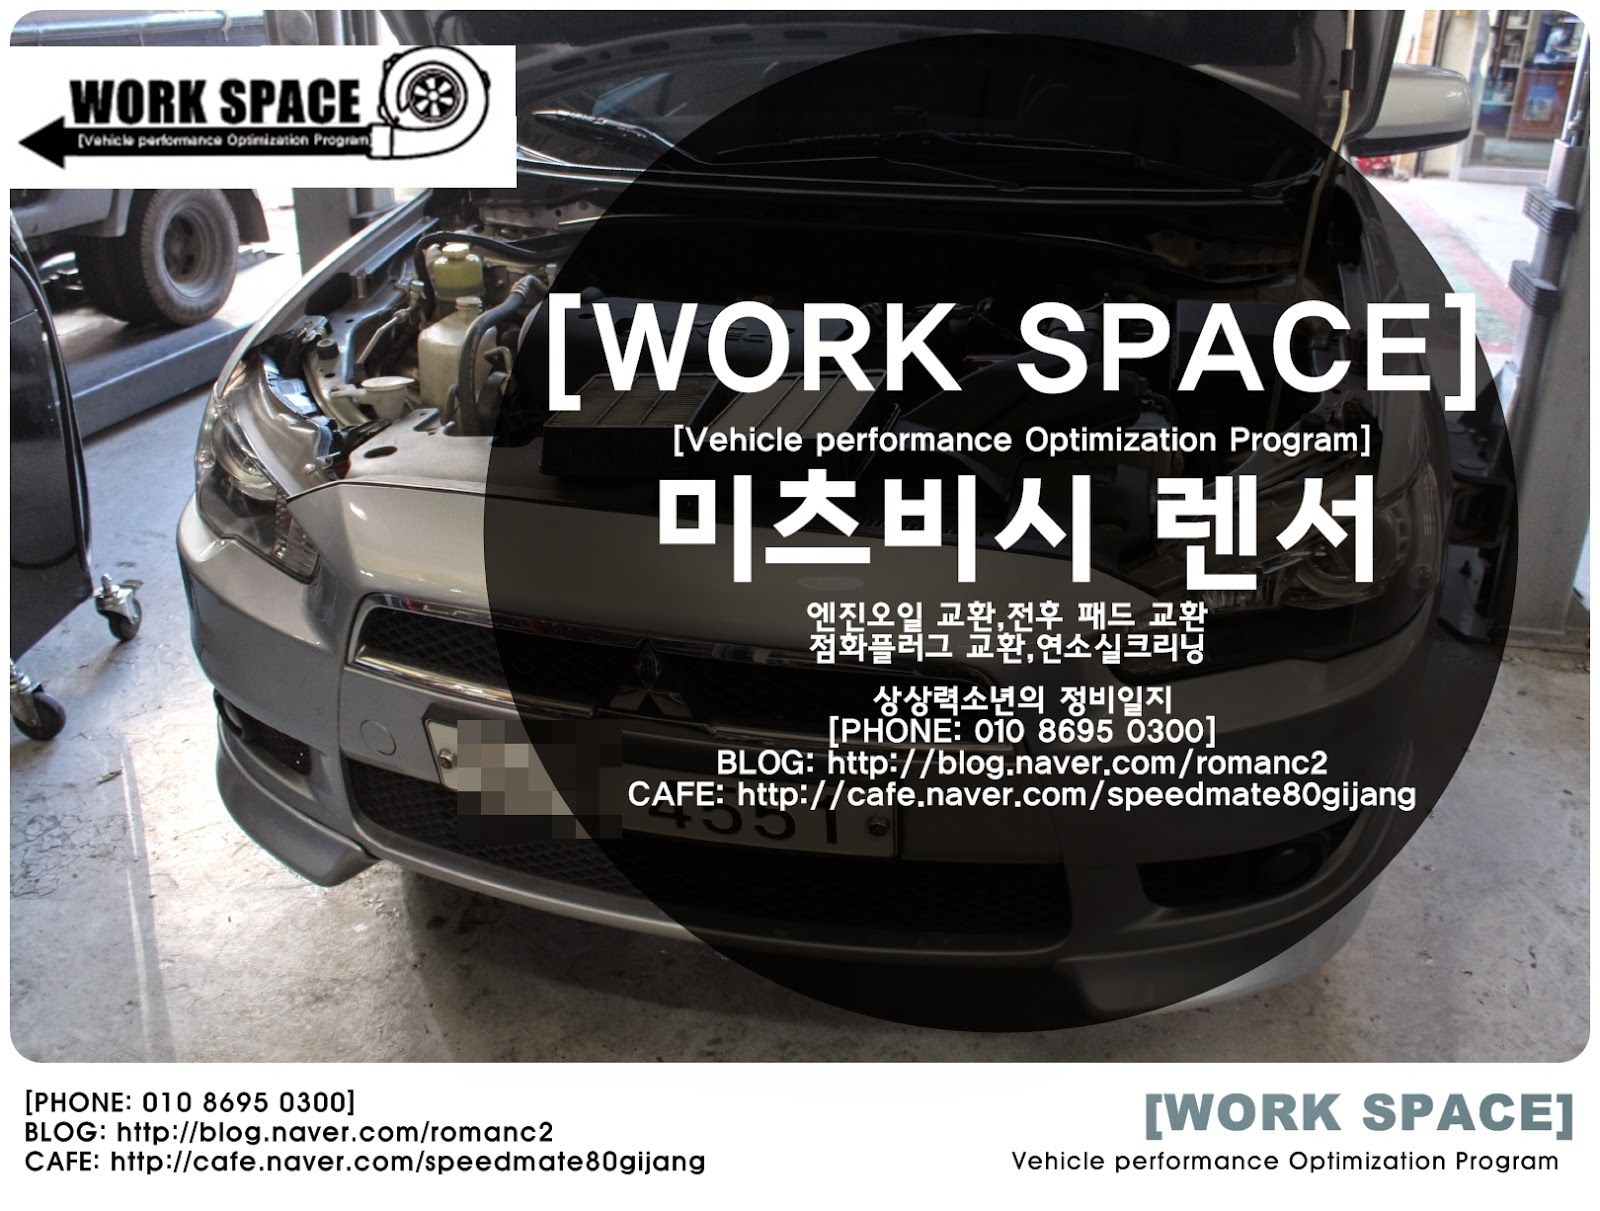 [WORK SPACE]           상상력소년의 정비일지: WORK LOG: 2015.02.06 차량성능 최적화 프로그램: 미츠비시 렌서 엔진오일 최...